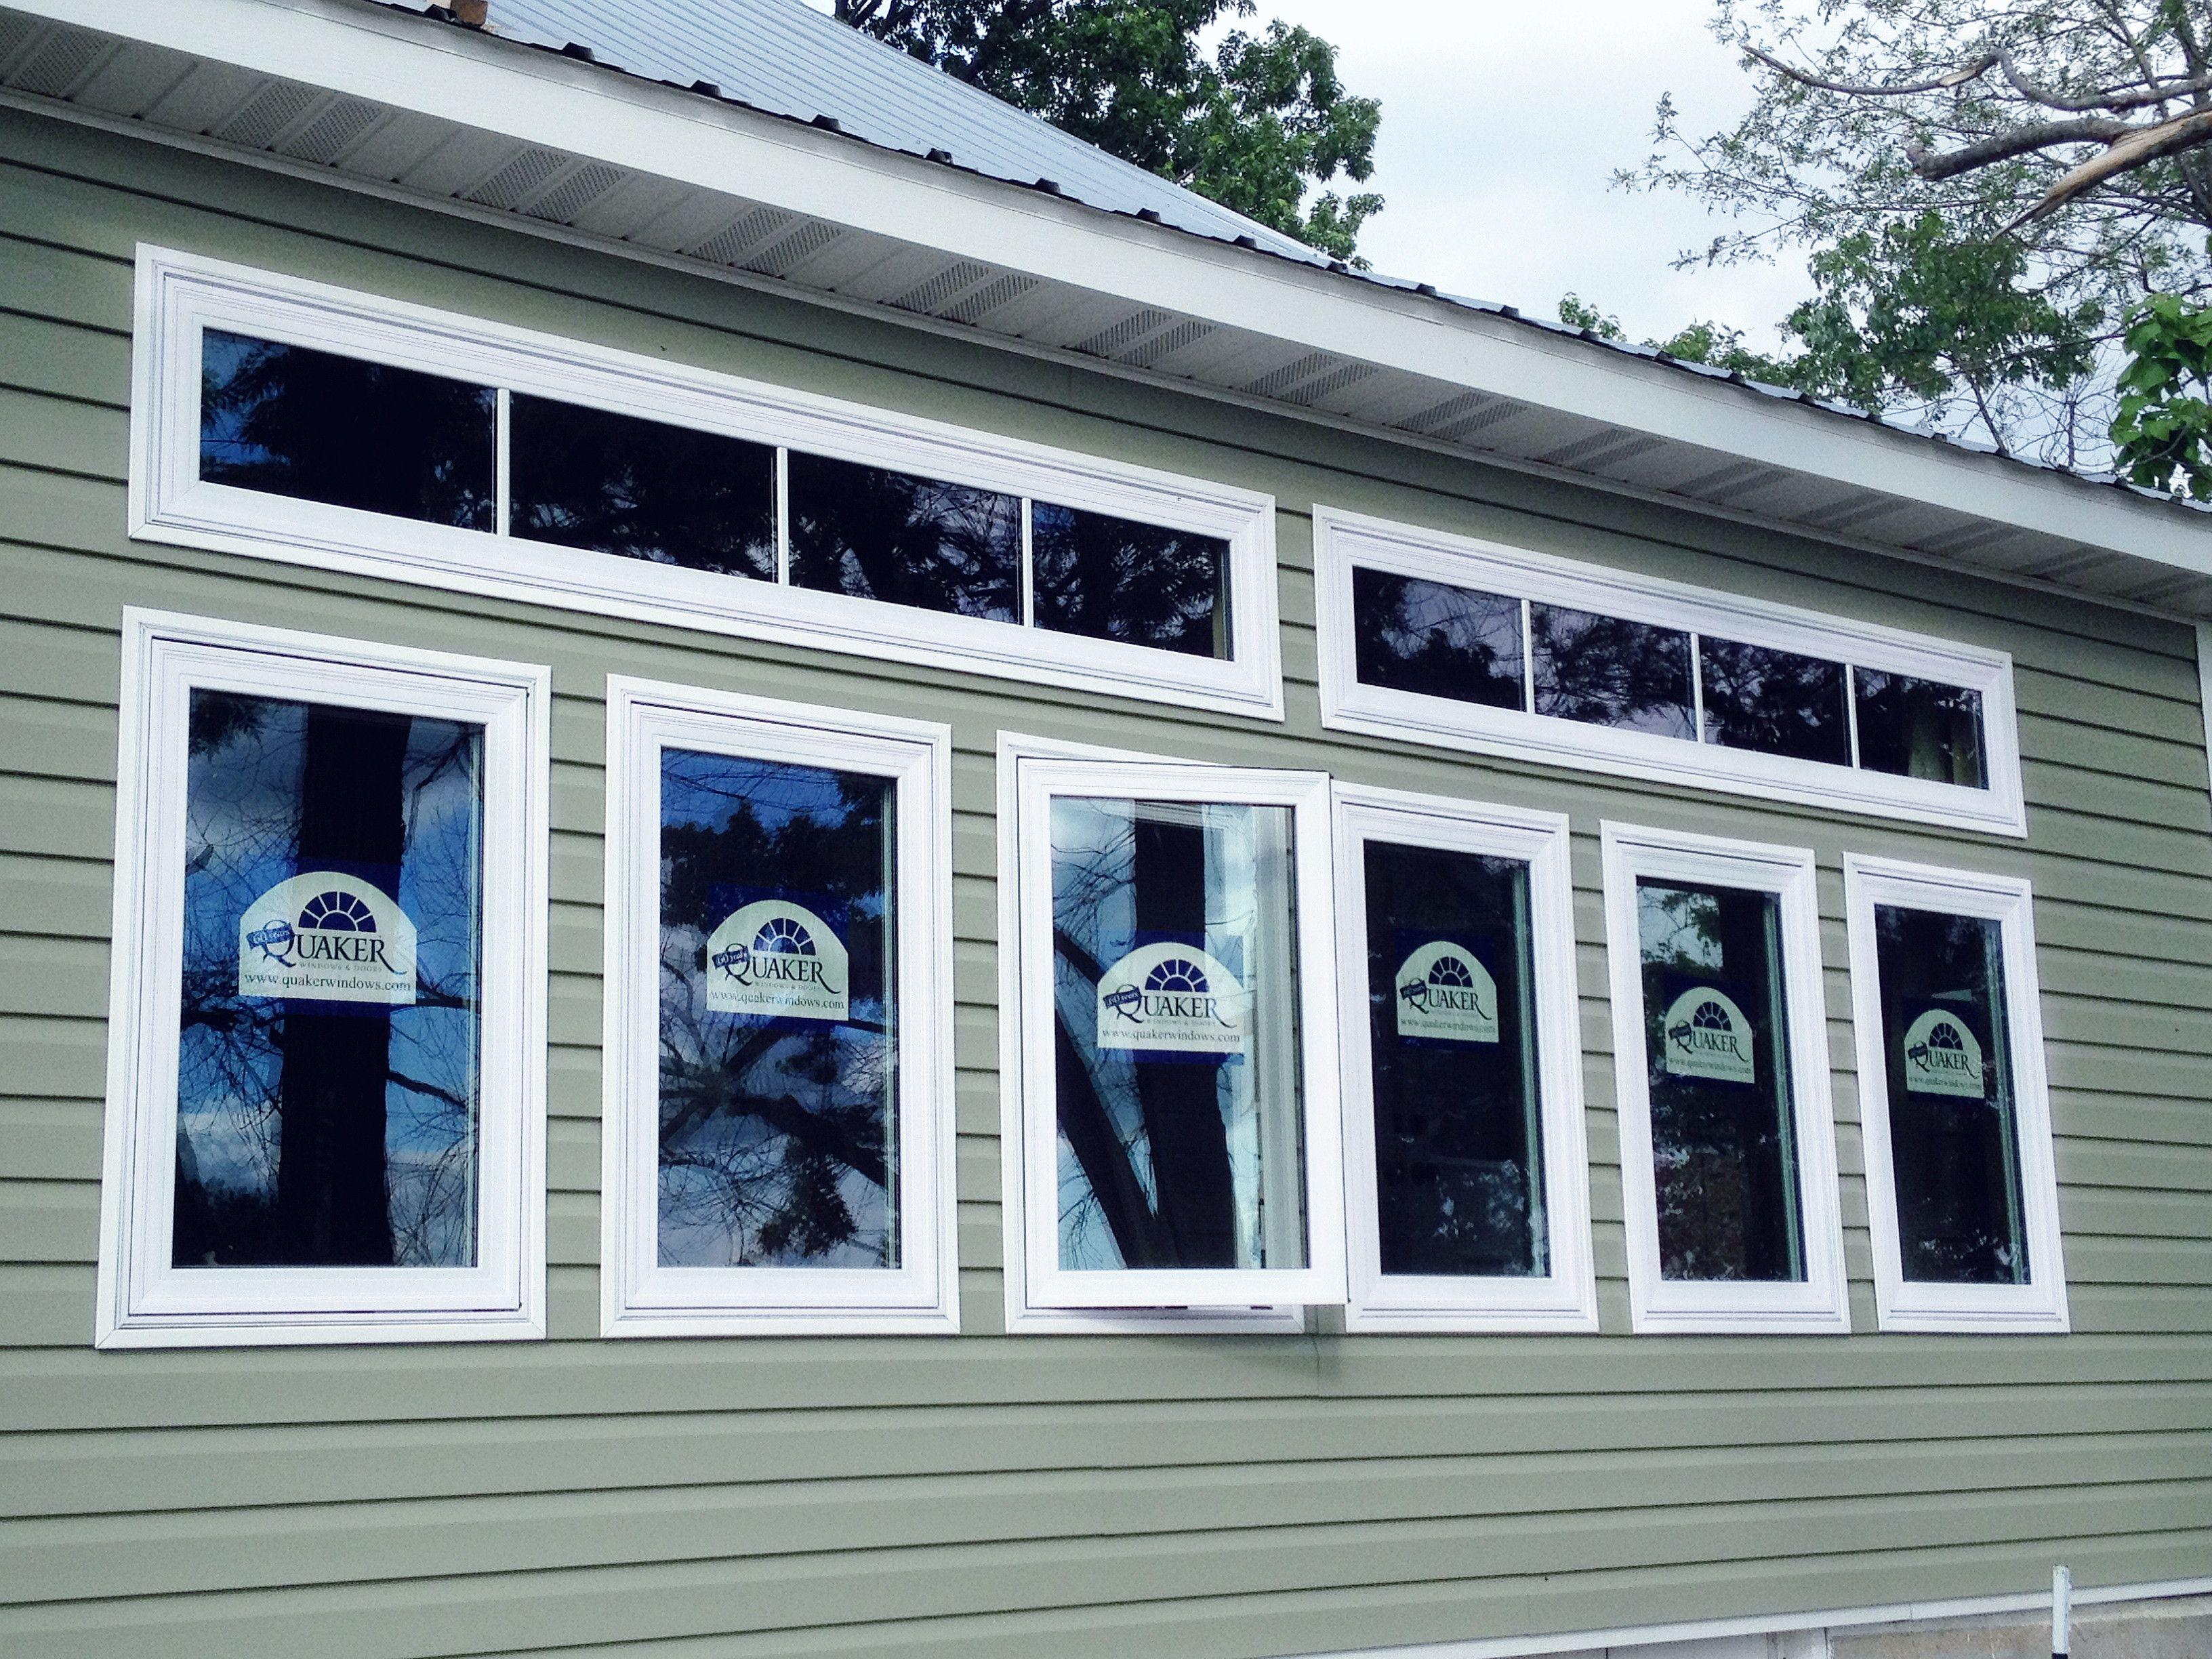 2448 #386993  By Quaker Windows & Doors On Residential Windows And Doors Pint image Residential Windows And Doors 47033264